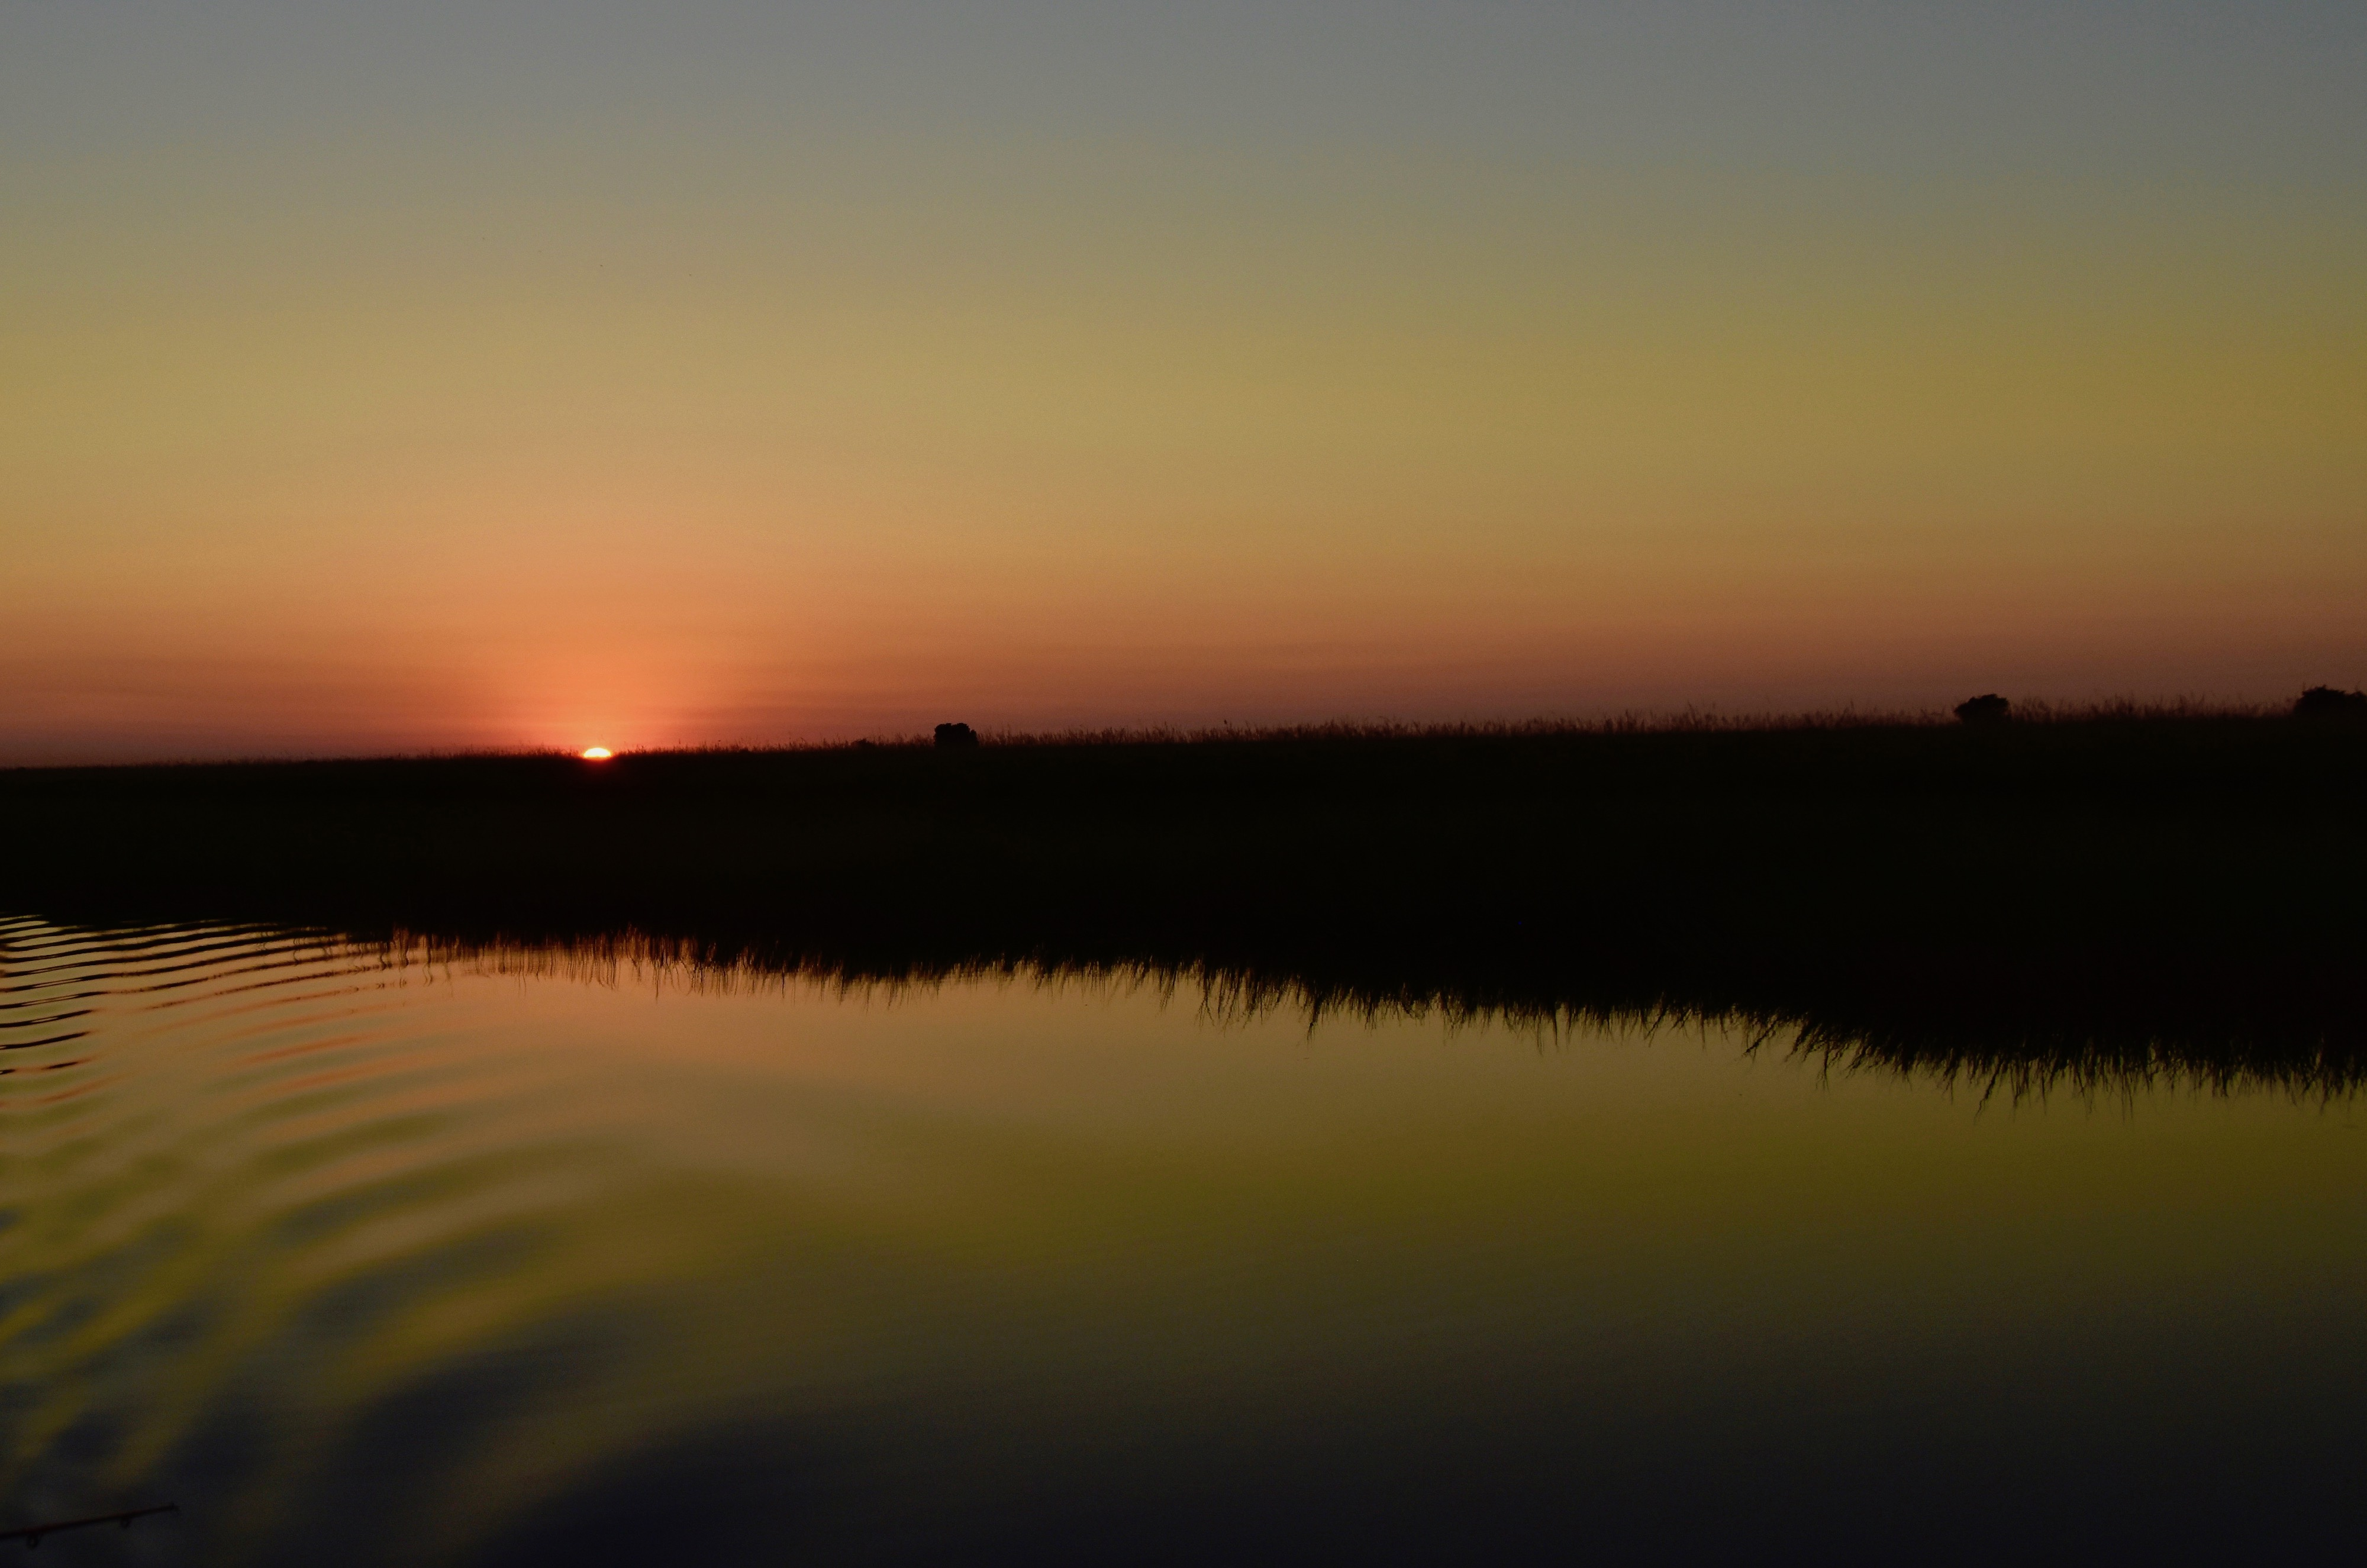 Sunrise on the Chobe River